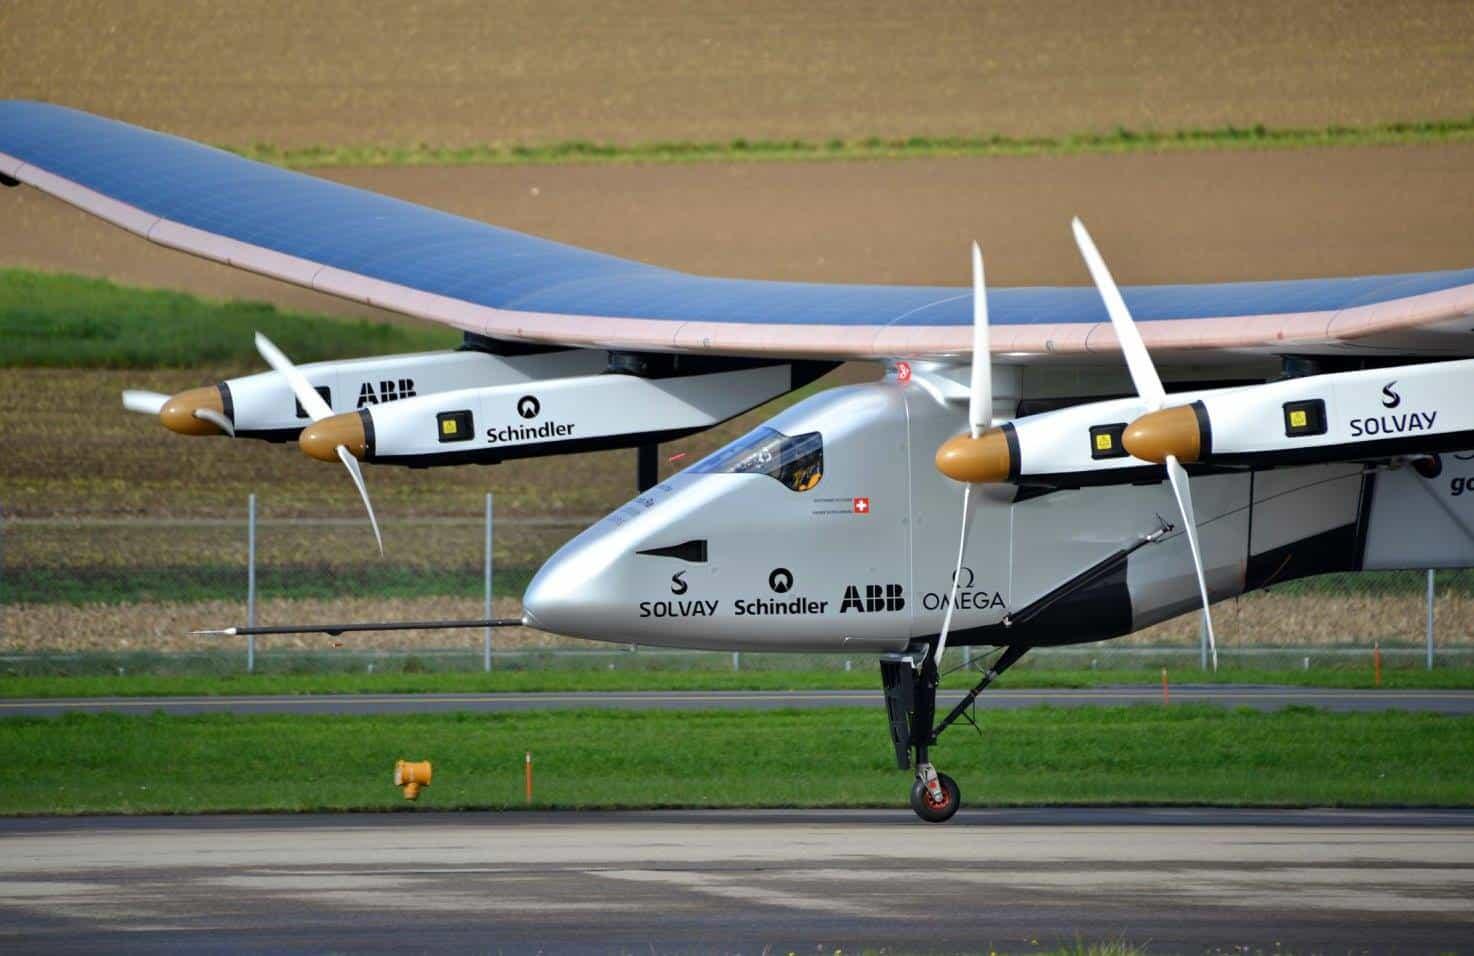 Bertrand Piccard brings Si2 in for a landing